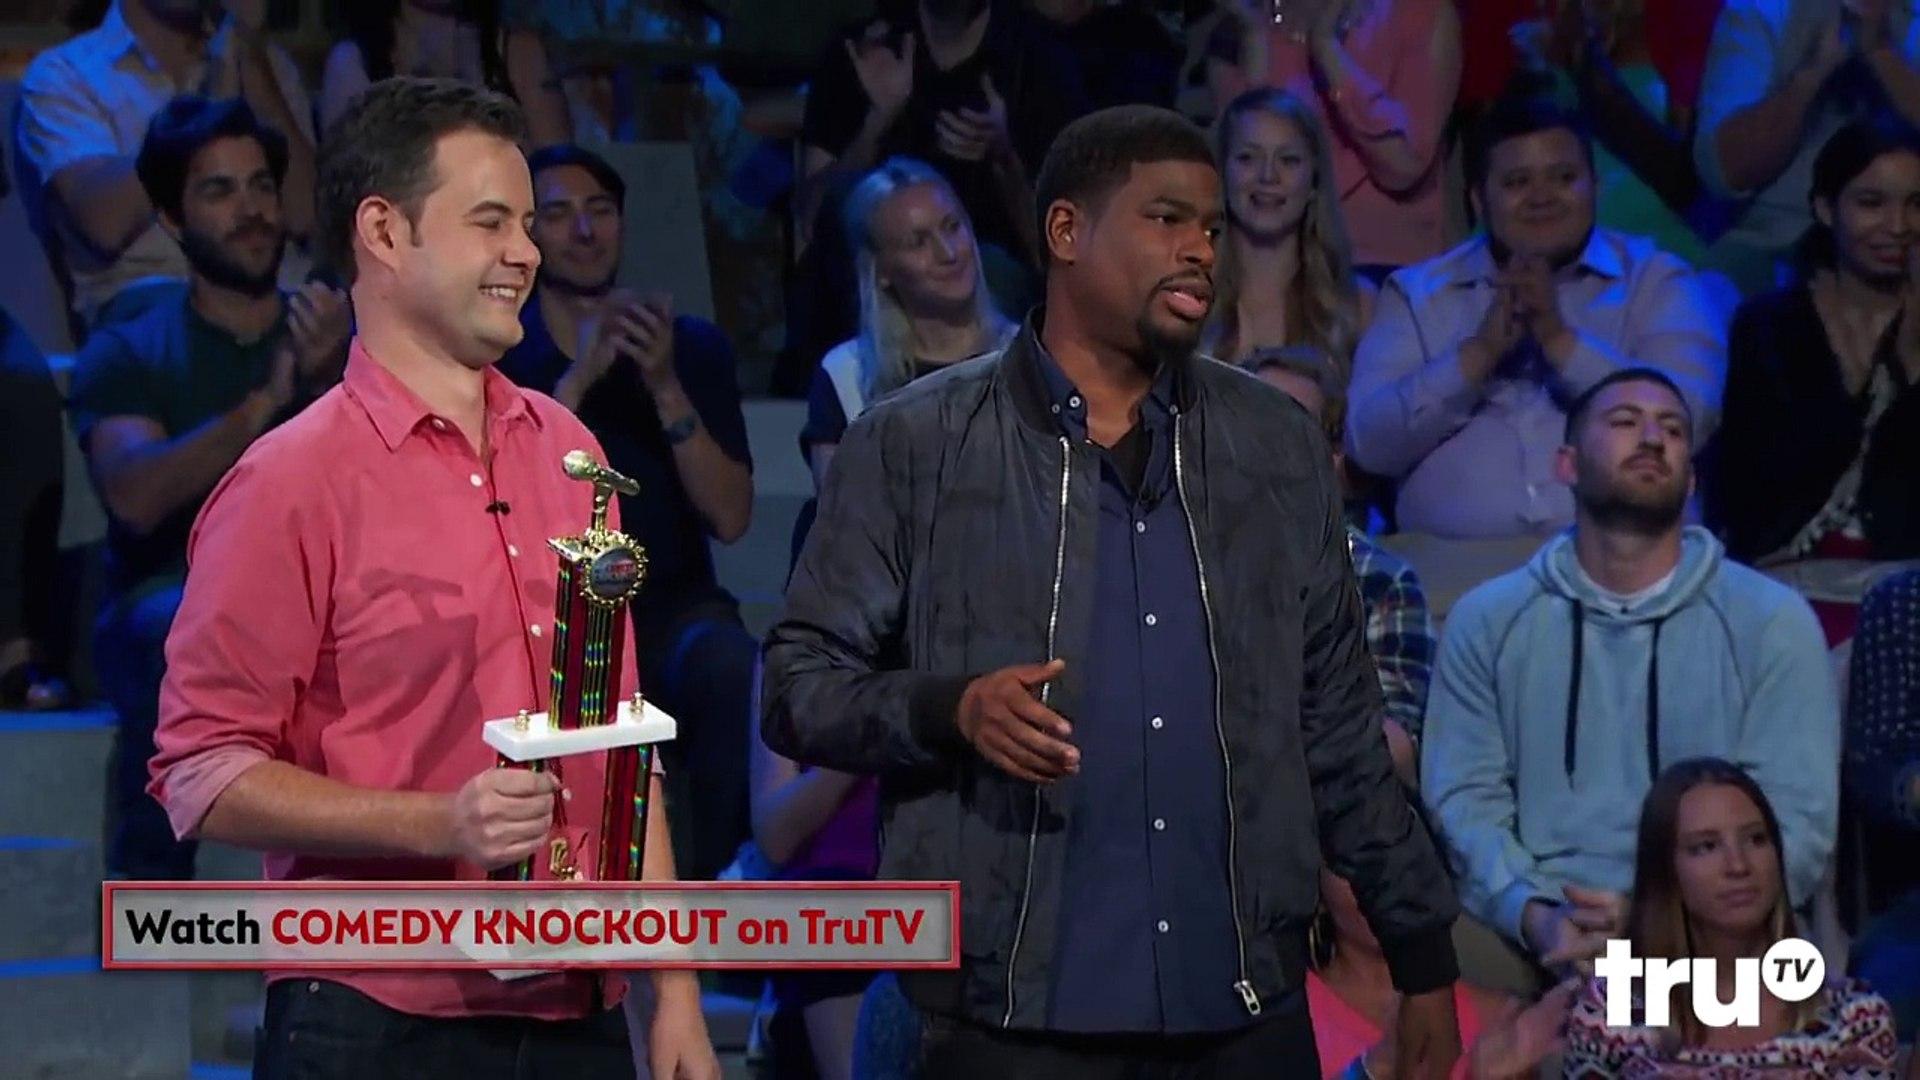 Comedy Knockout - Apology: Dulce Sloan